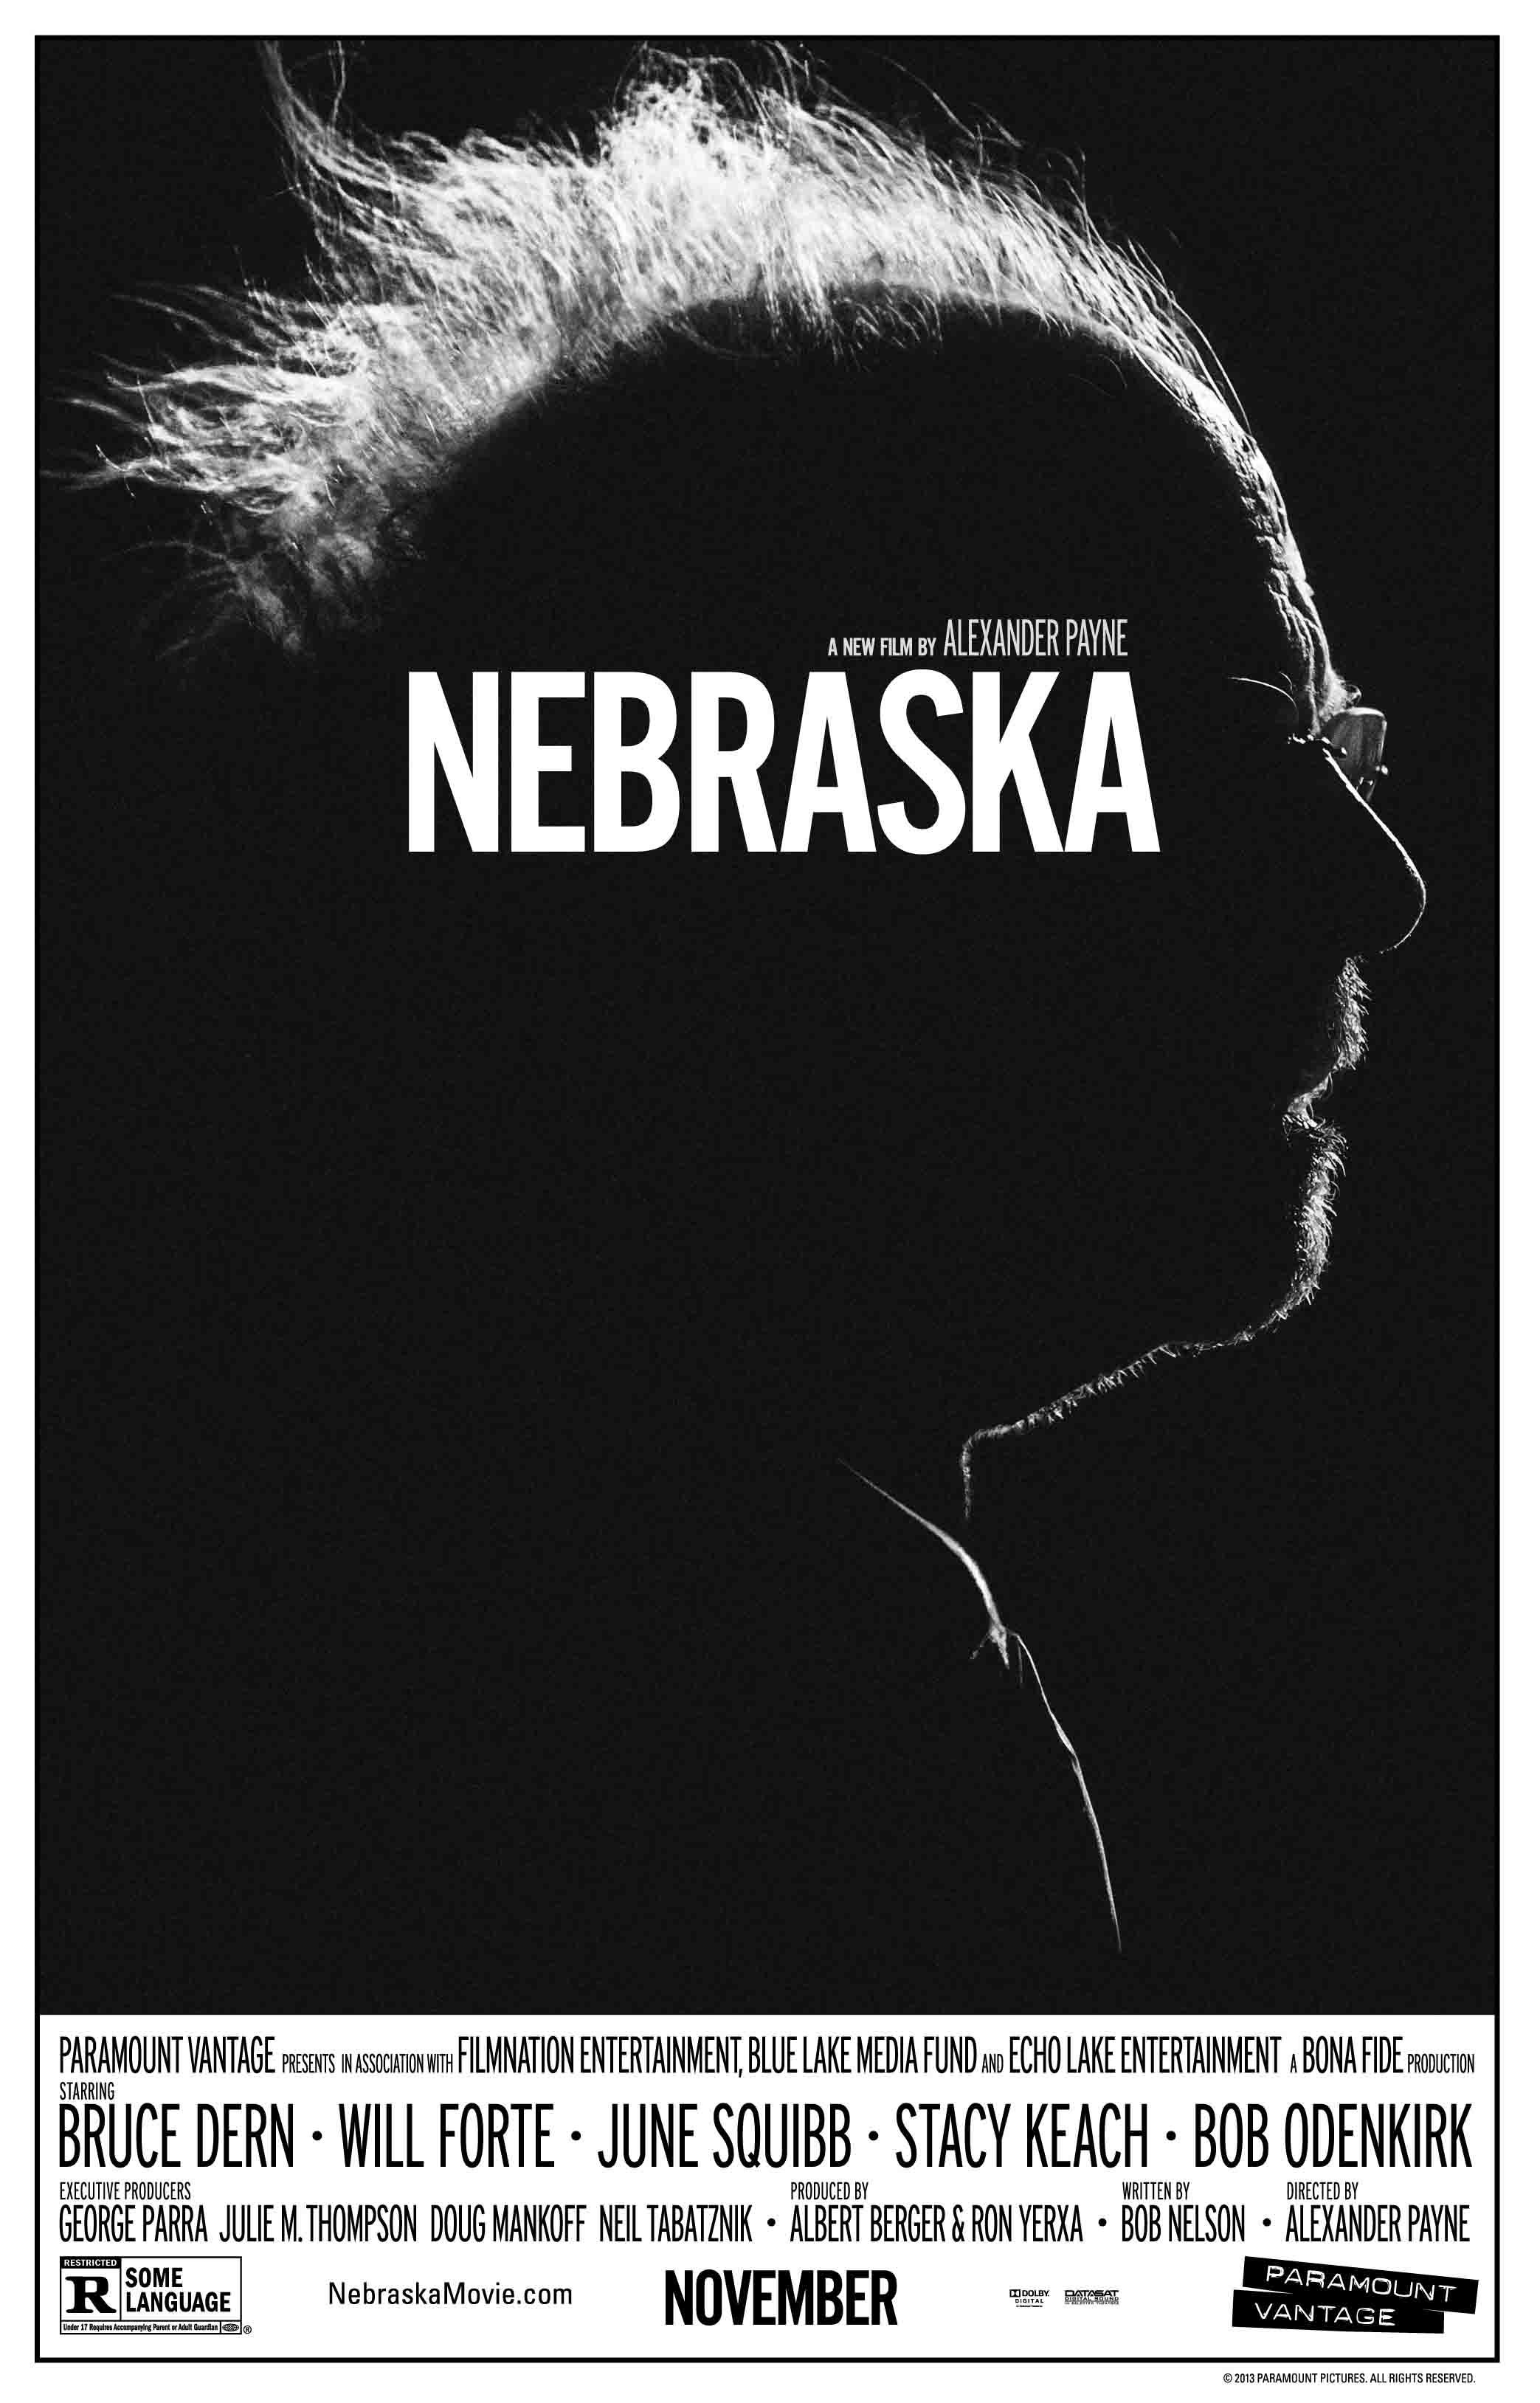 M2013034CIM  内布拉斯加 Nebraska (2013).jpg